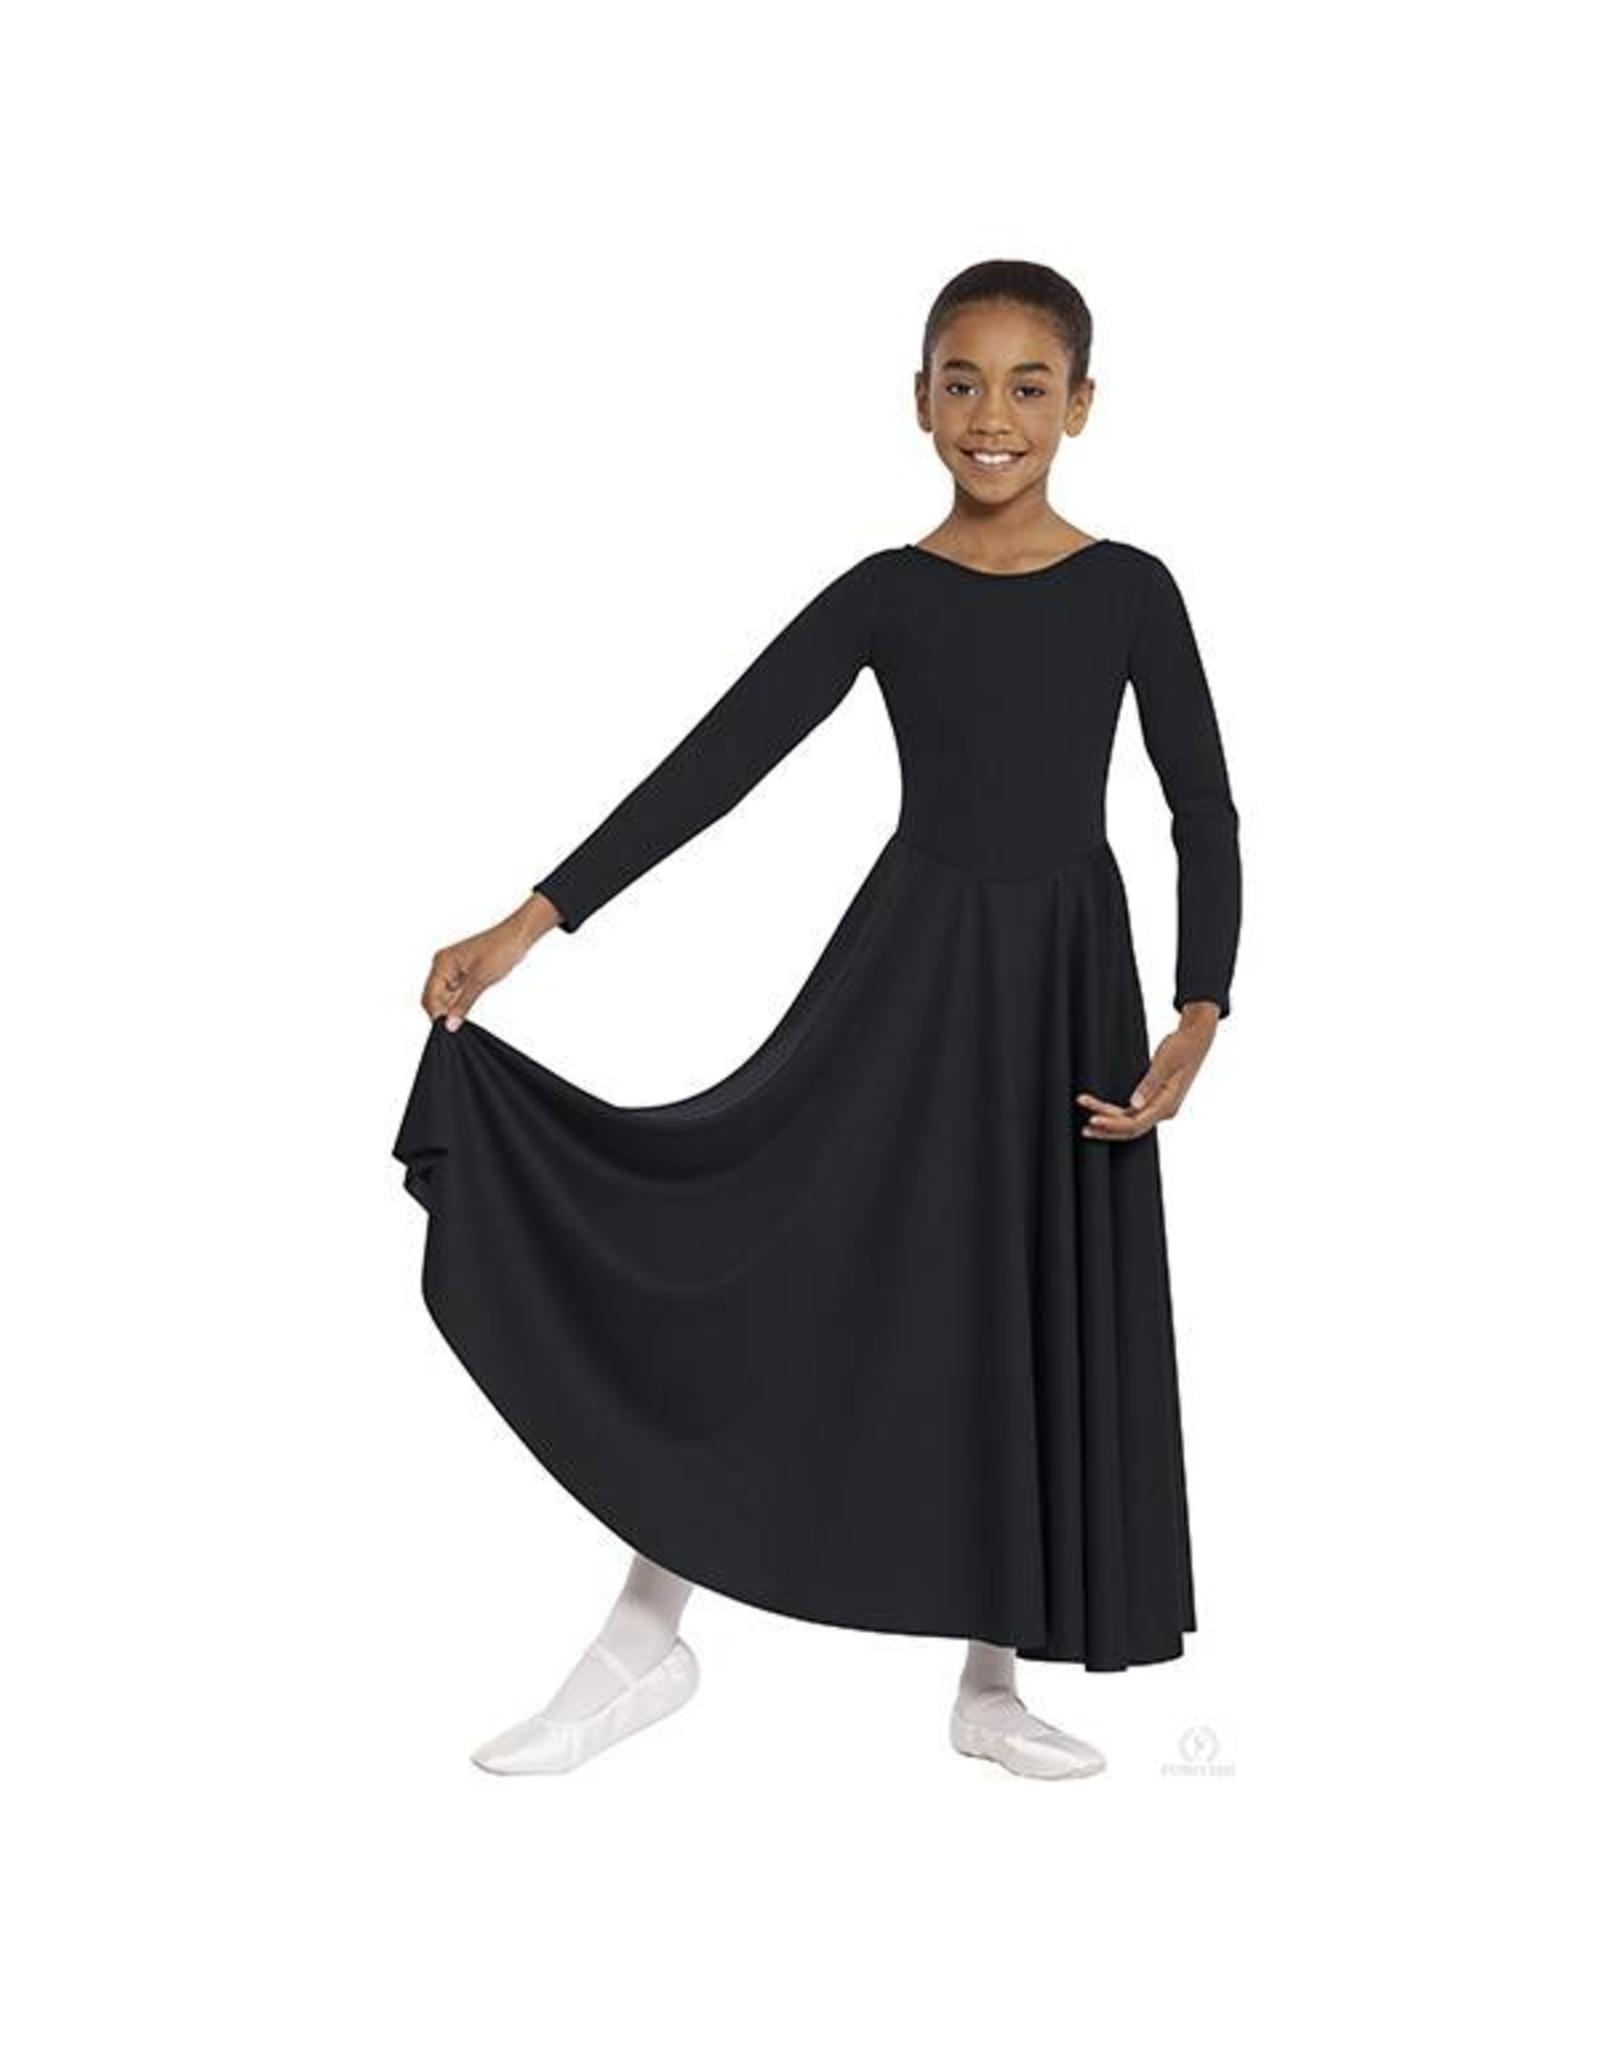 13524C CHILD LITURGICAL DRESS BLACK